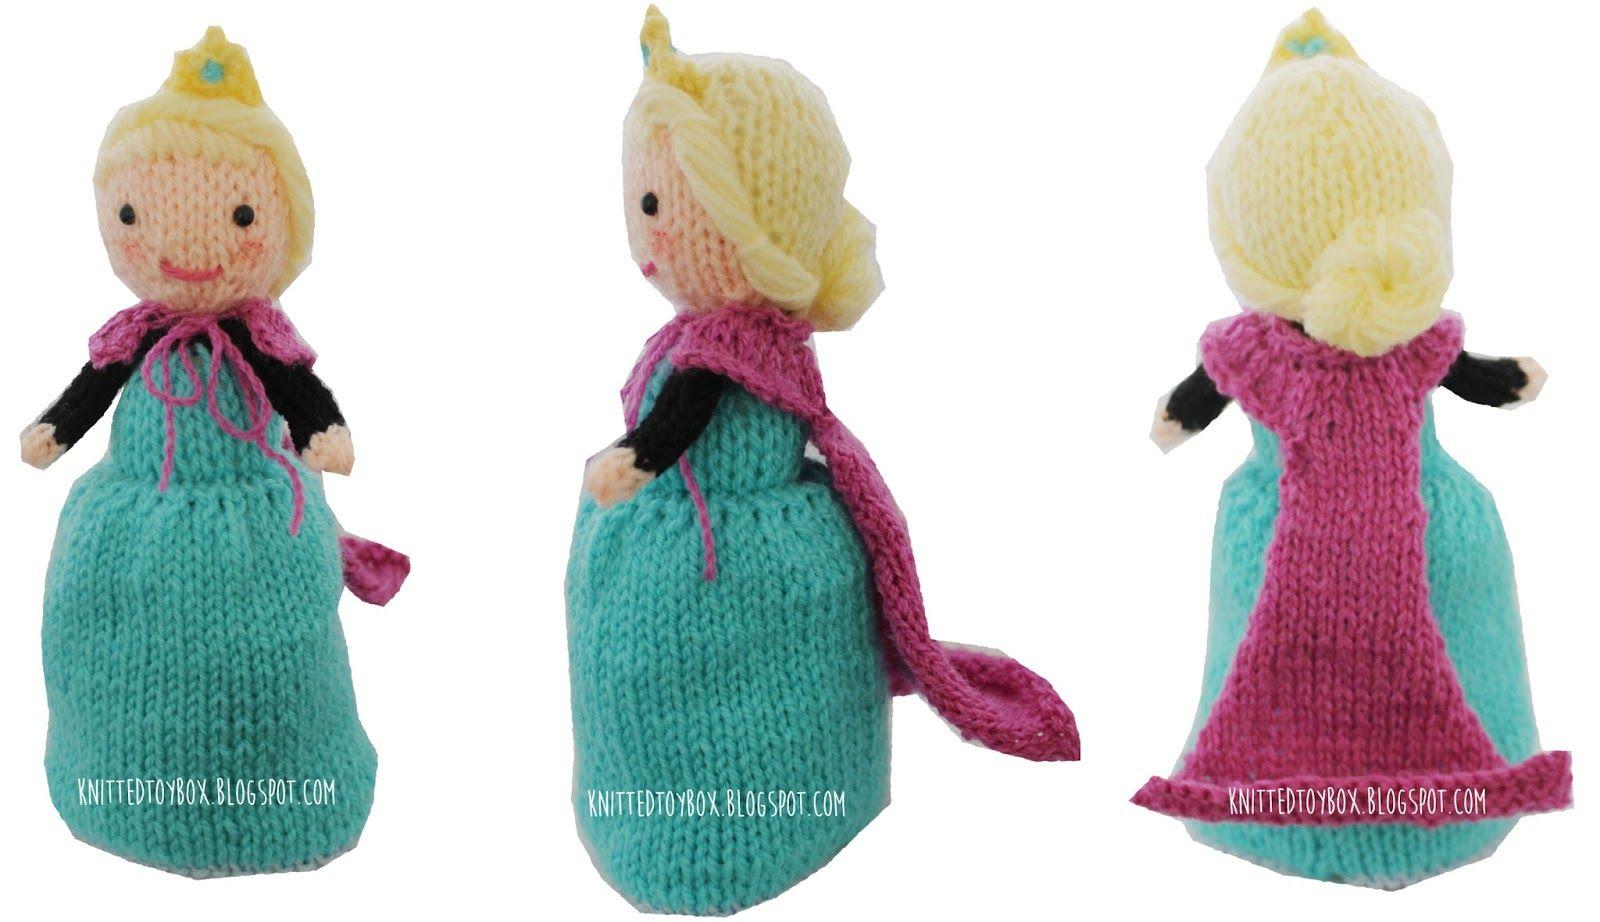 Knitted Toy Box: Elsa Frozen Flip Doll | Knitting | Pinterest